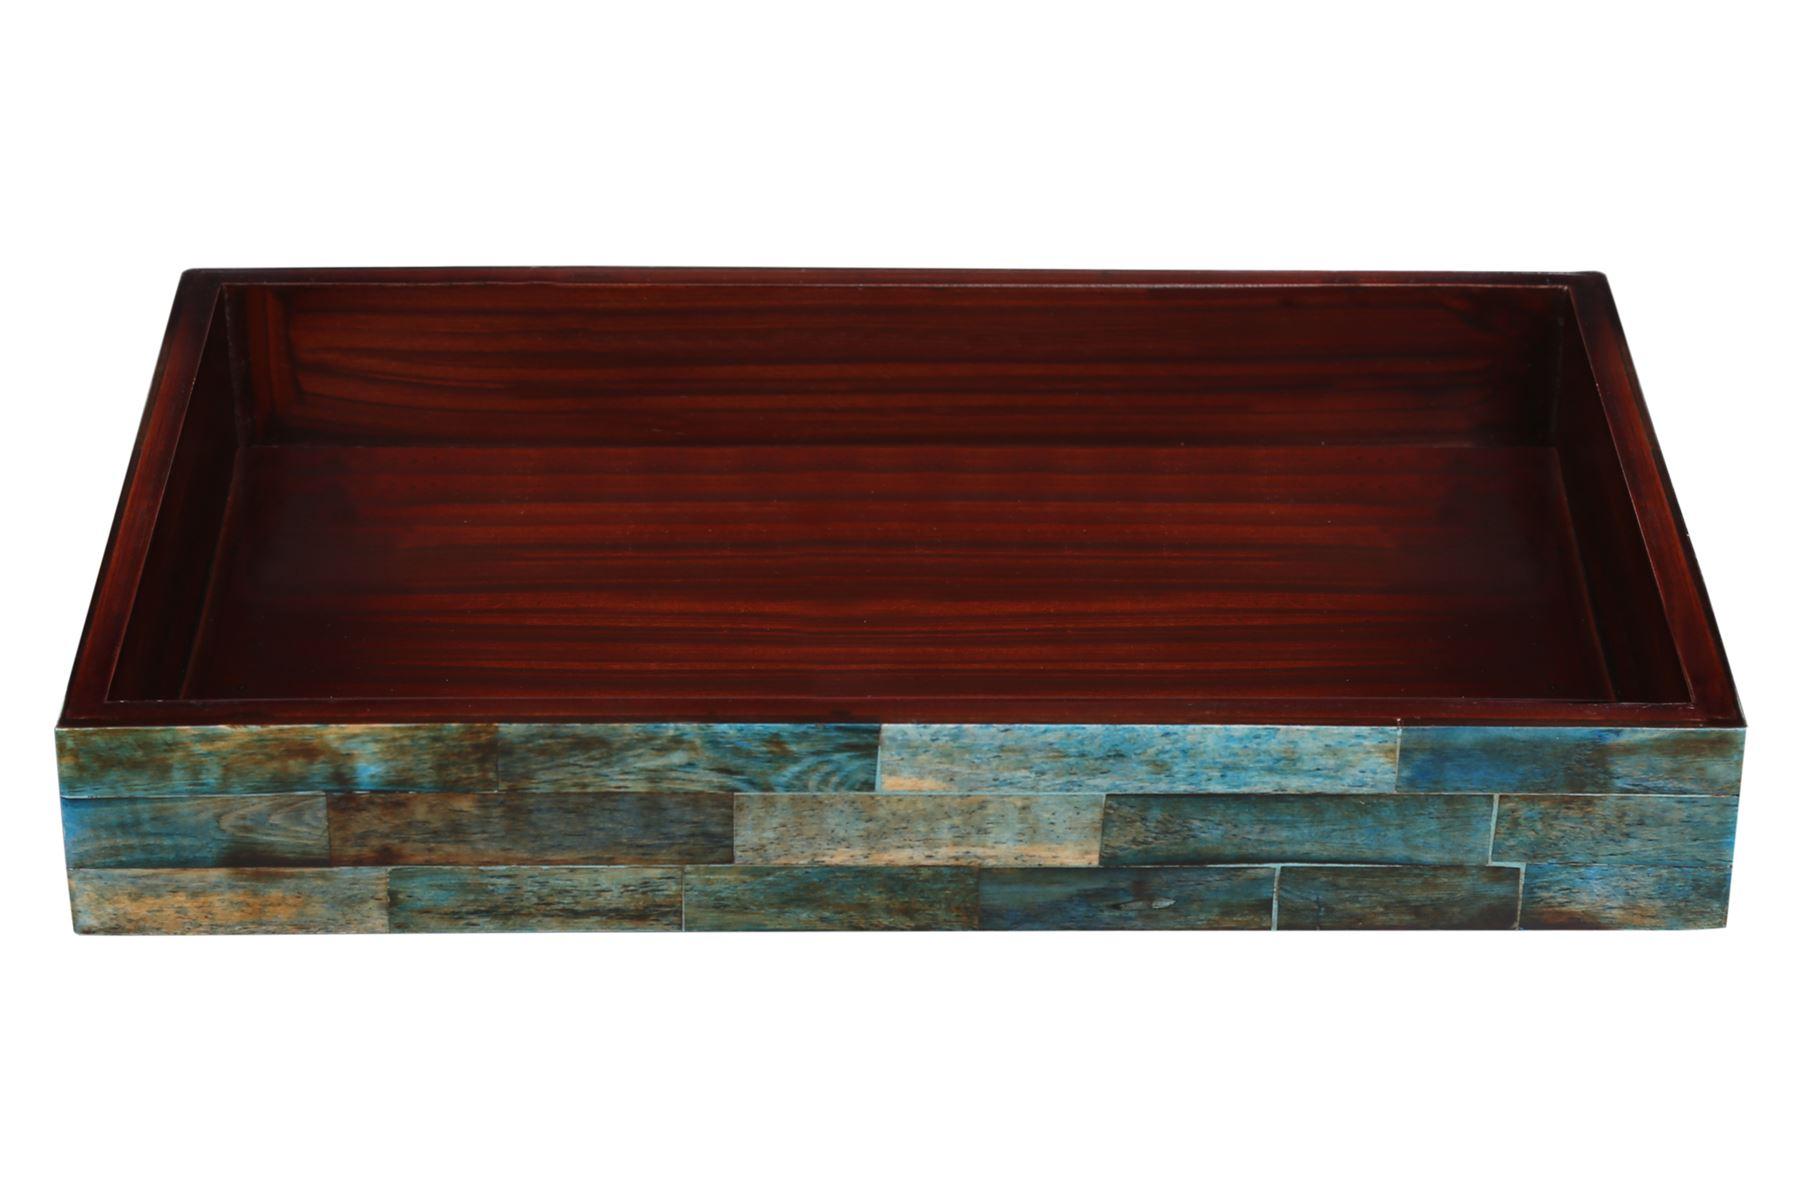 Handicrafts-Home-Verdigris-Ideal-Ottoman-Multipurpose-Serving-Decorative-Tray thumbnail 4